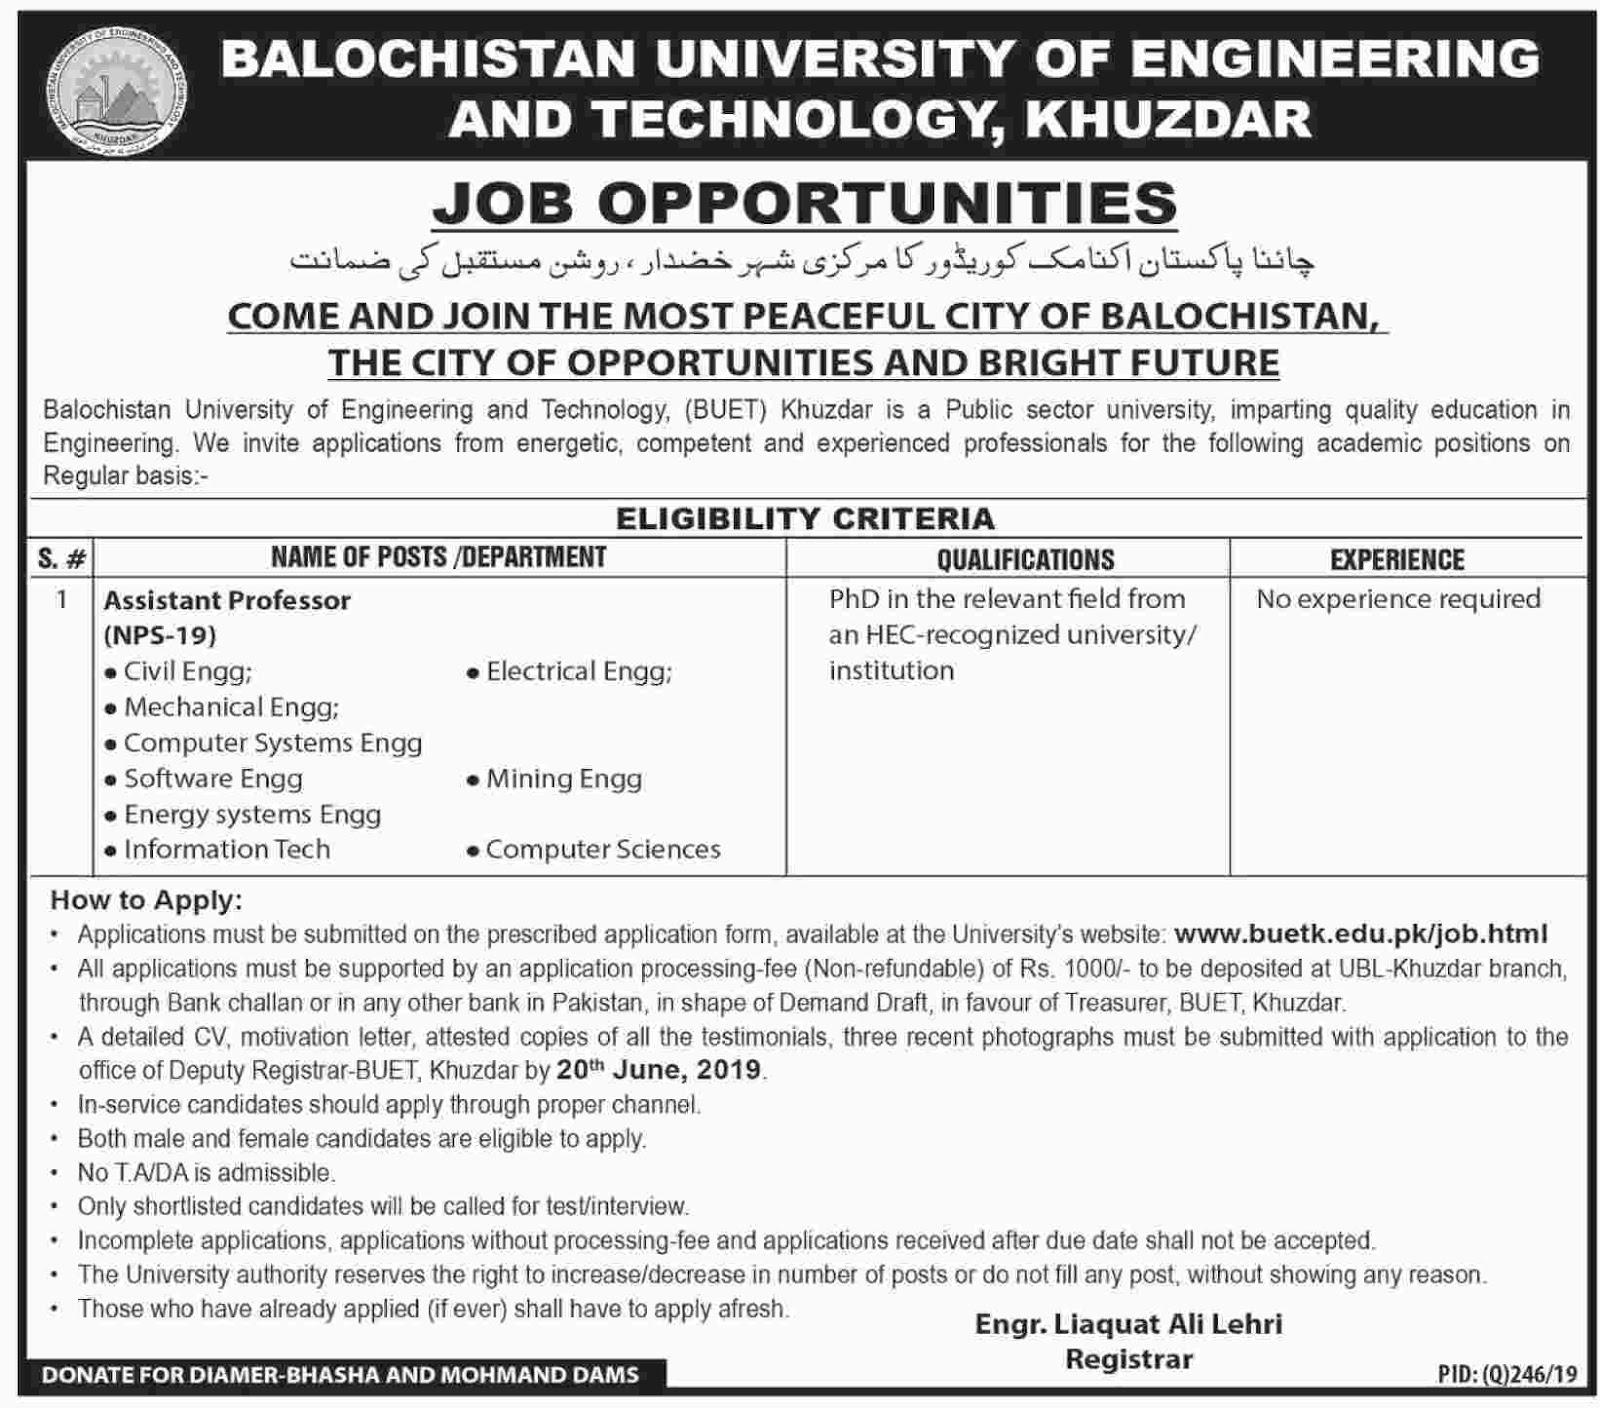 Latest Vacancies in Balochistan University of Engineering and Technolgy, Khuzdar 12 June 2019